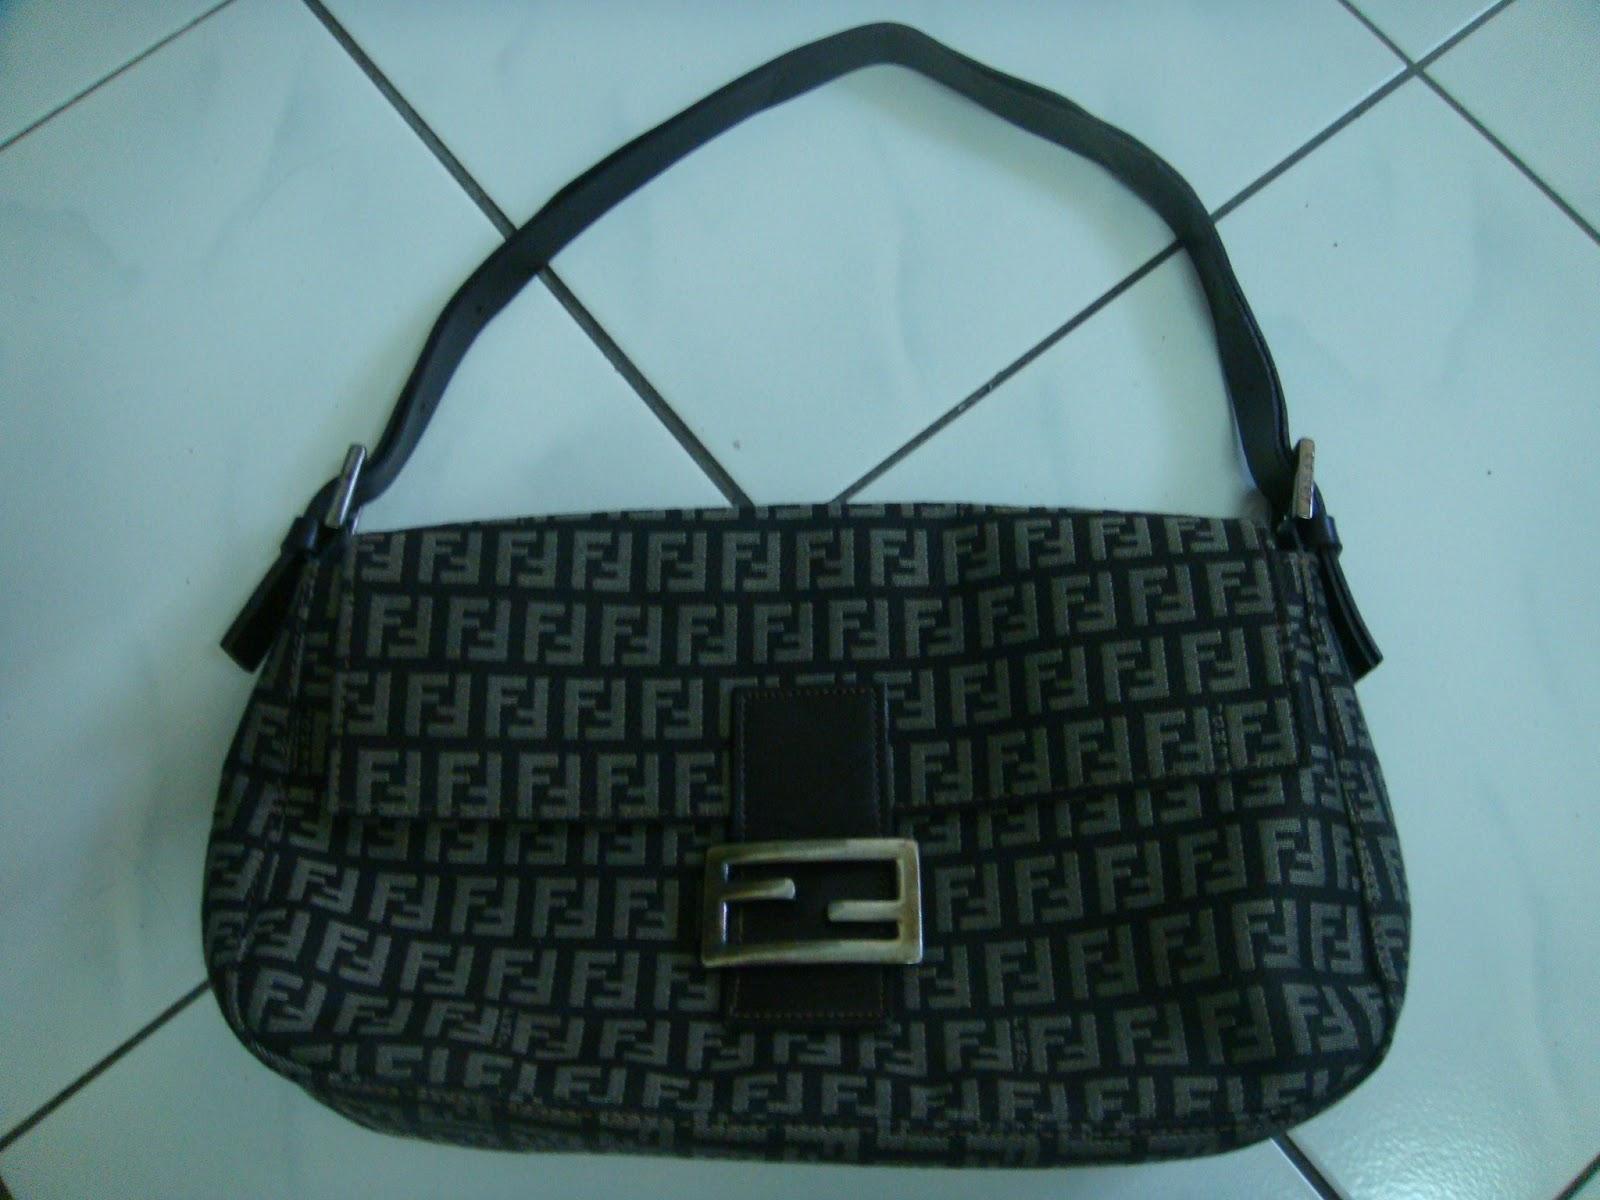 SUKABUNDLE 2  Authentic Fendi Hand bag -SOLD- e7f8ee8a8f2f4